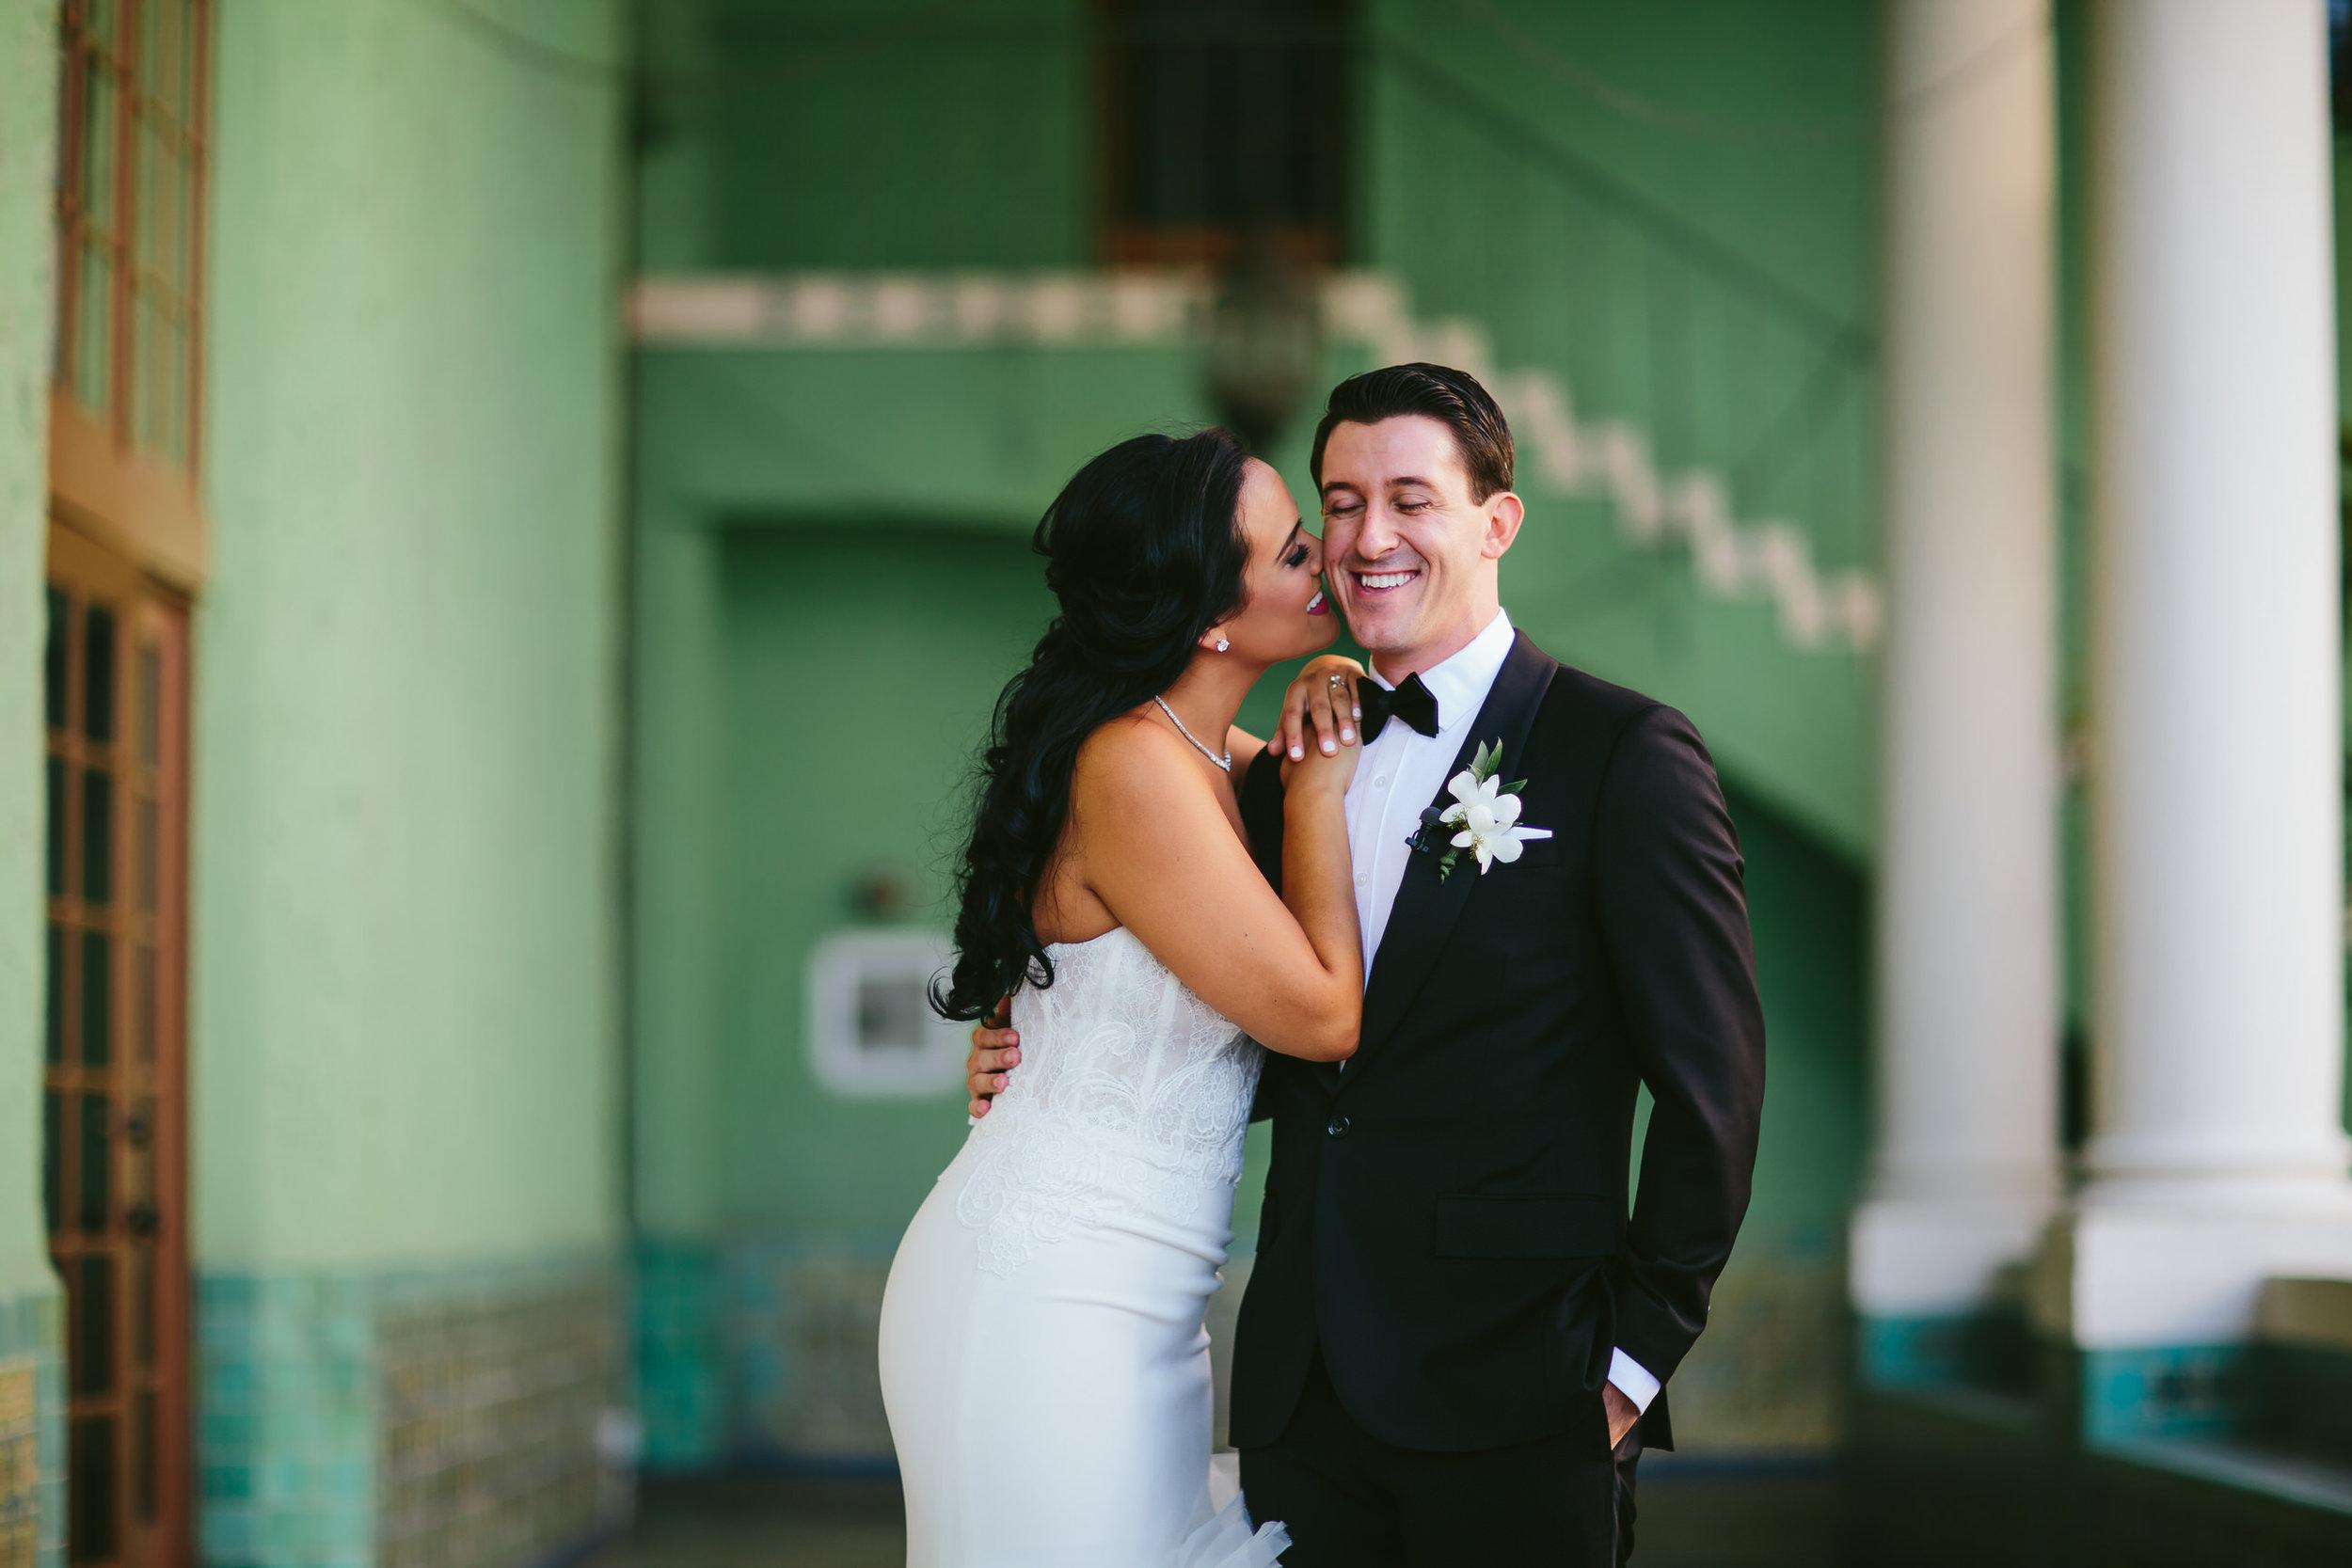 biltmore-wedding-steph-lynn-photo-photographer-bride-and-groom-9.jpg